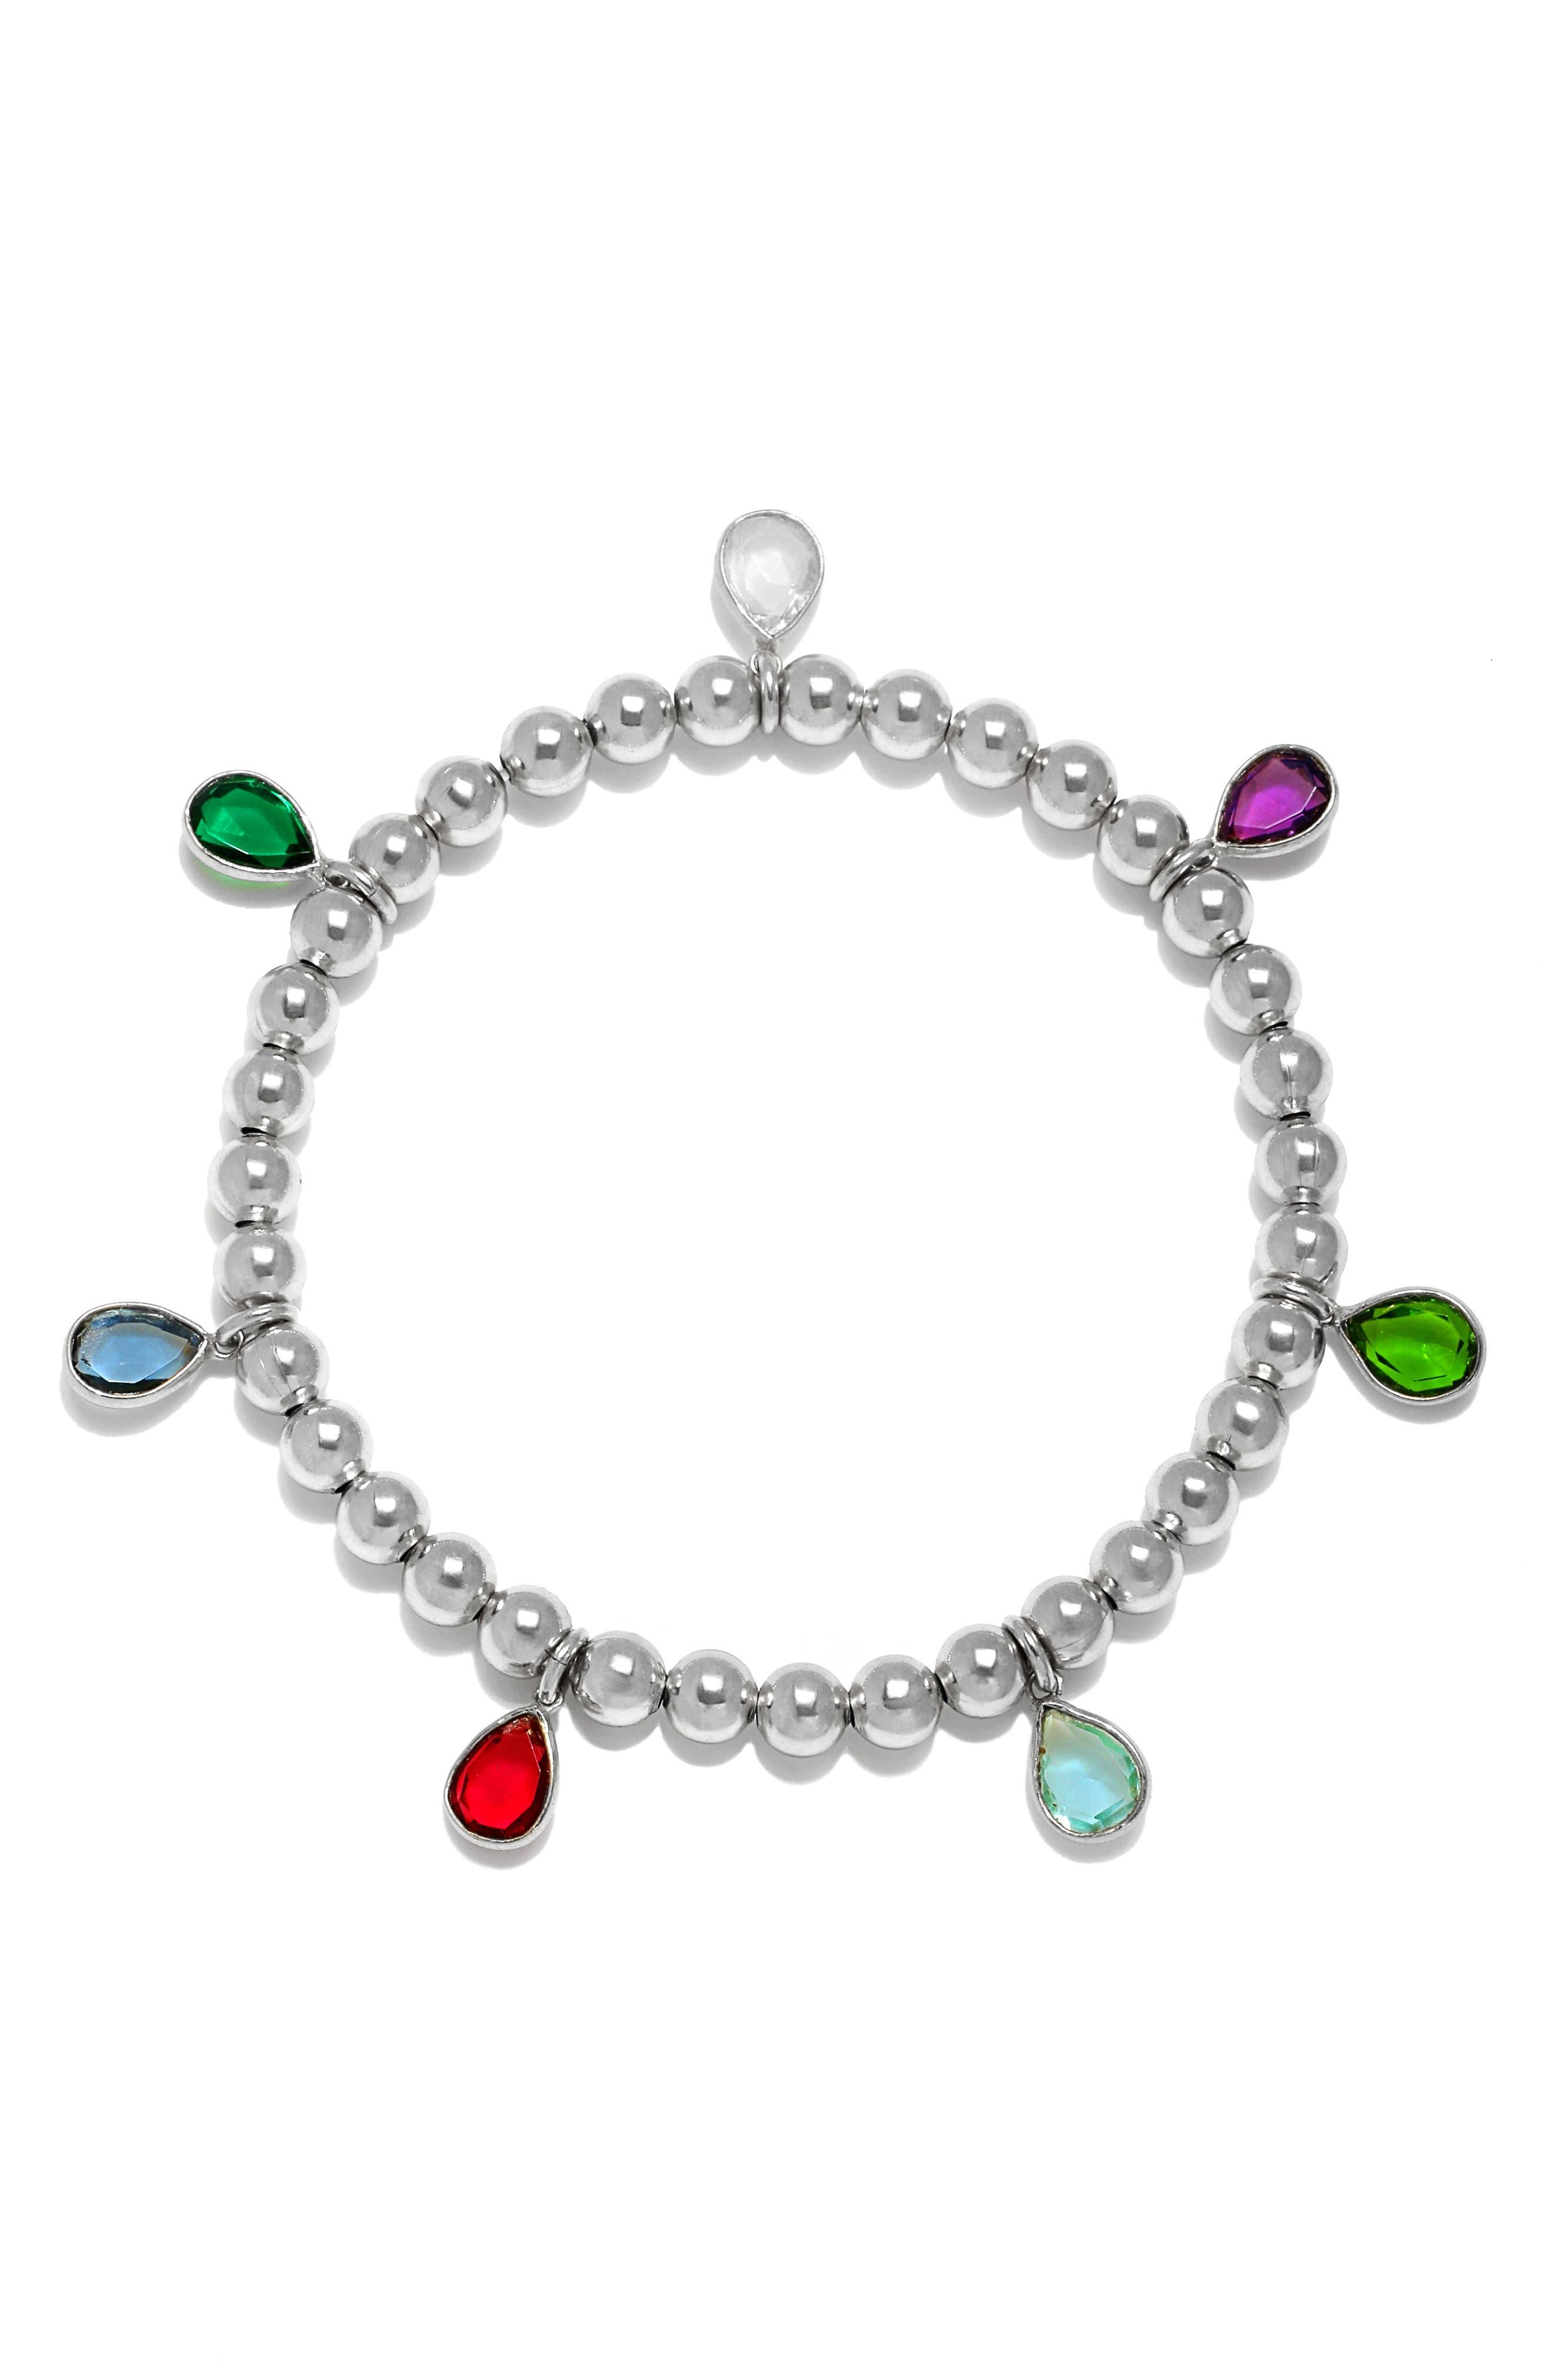 Amelia Rose Quartz Teardrop Beaded Stretch Bracelet in Multi Color - Silver at Nordstrom